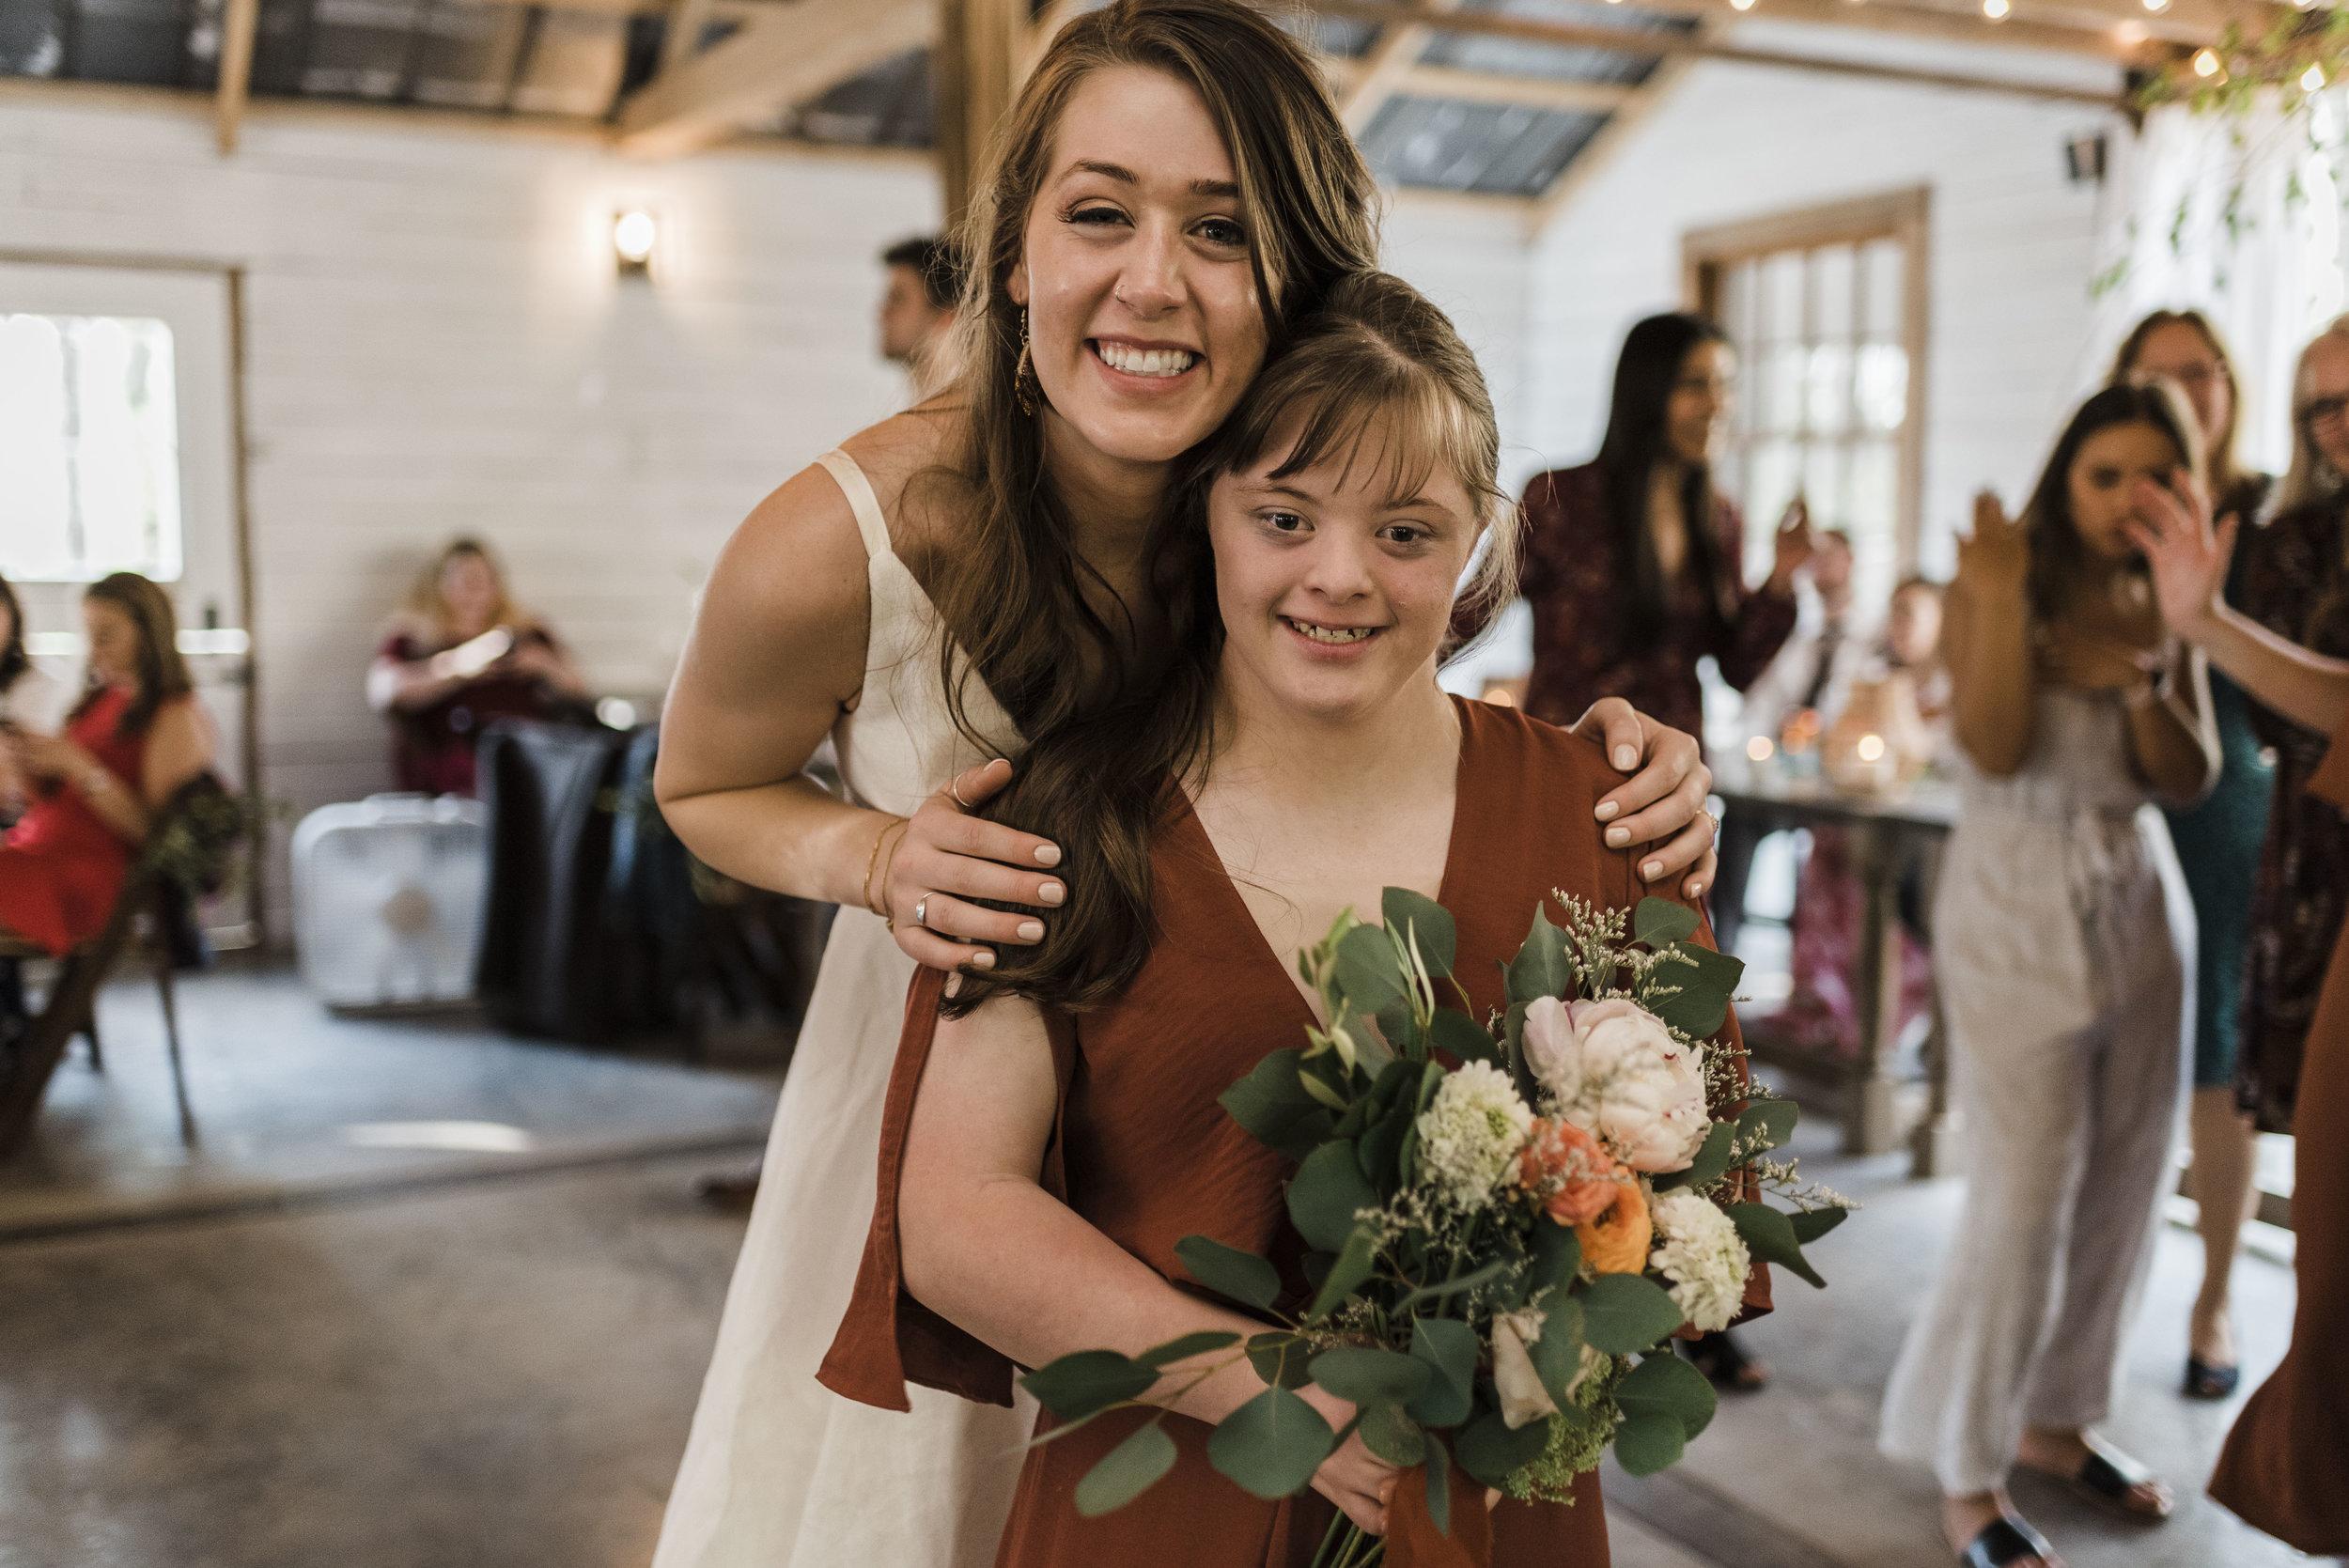 wedding bouquet toss dancing reception Chattanooga Tennessee